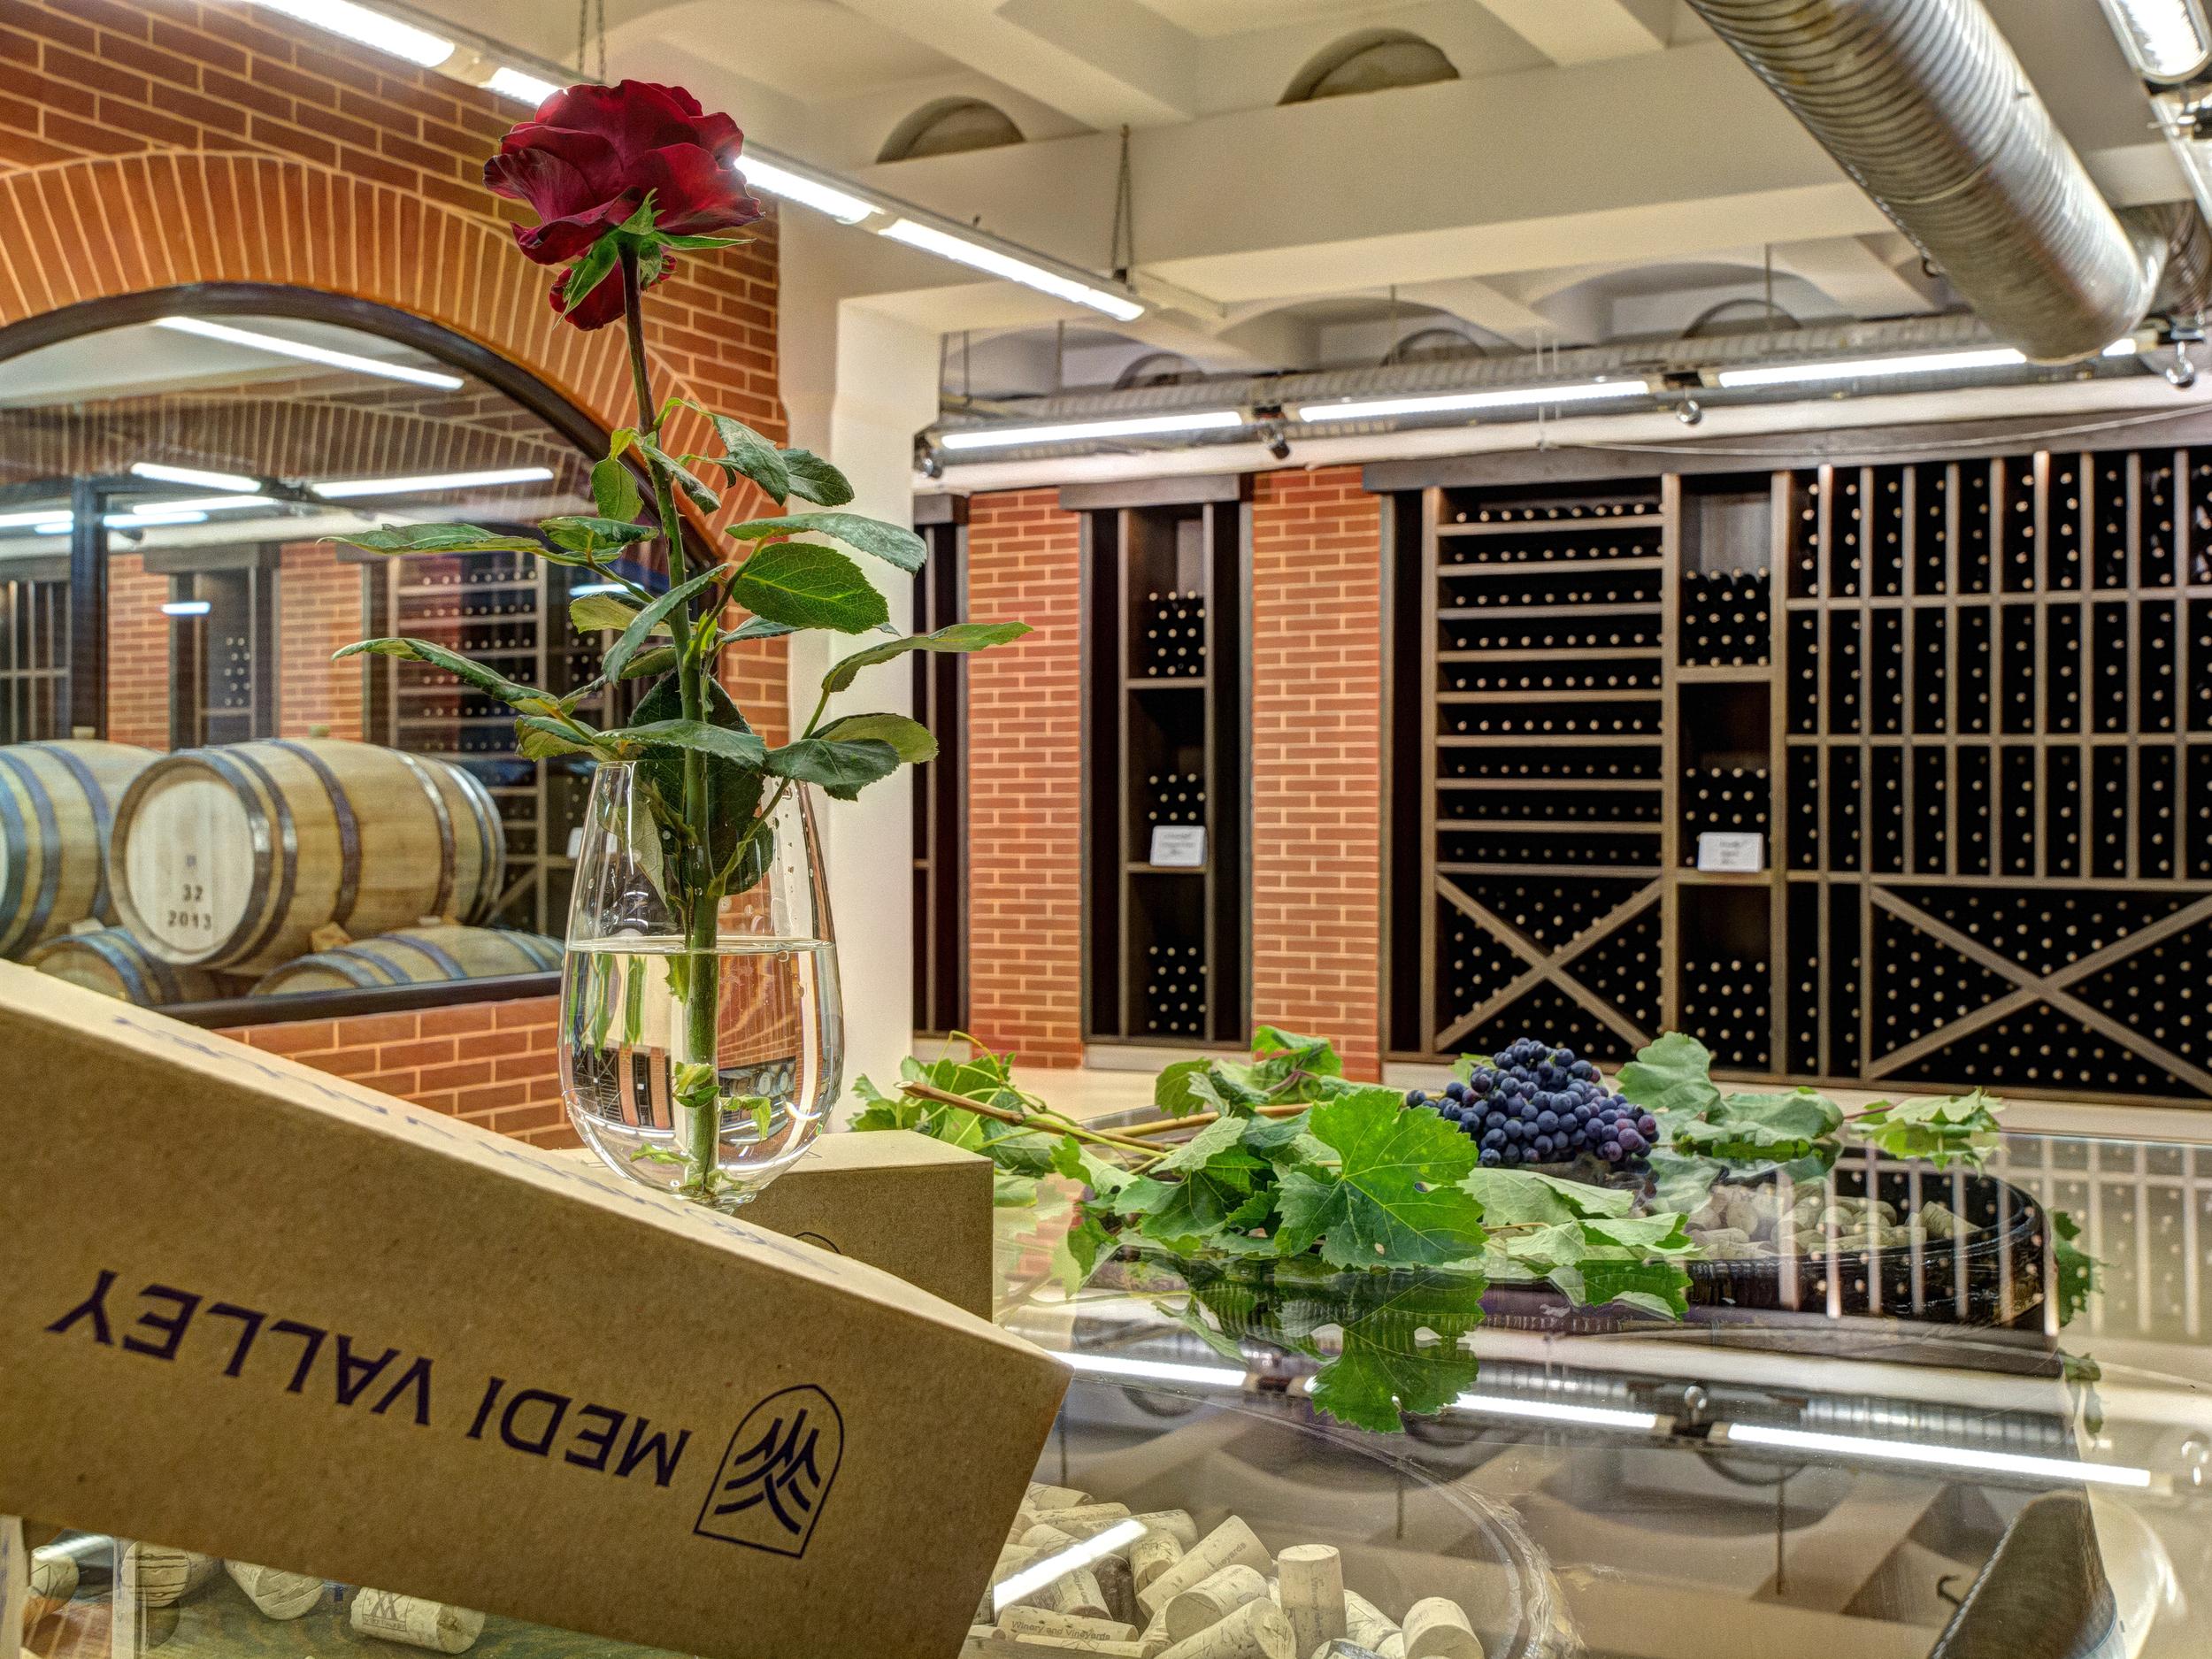 Medi Valley Wine Cellar | Photo Credit: Medi Valley Winery